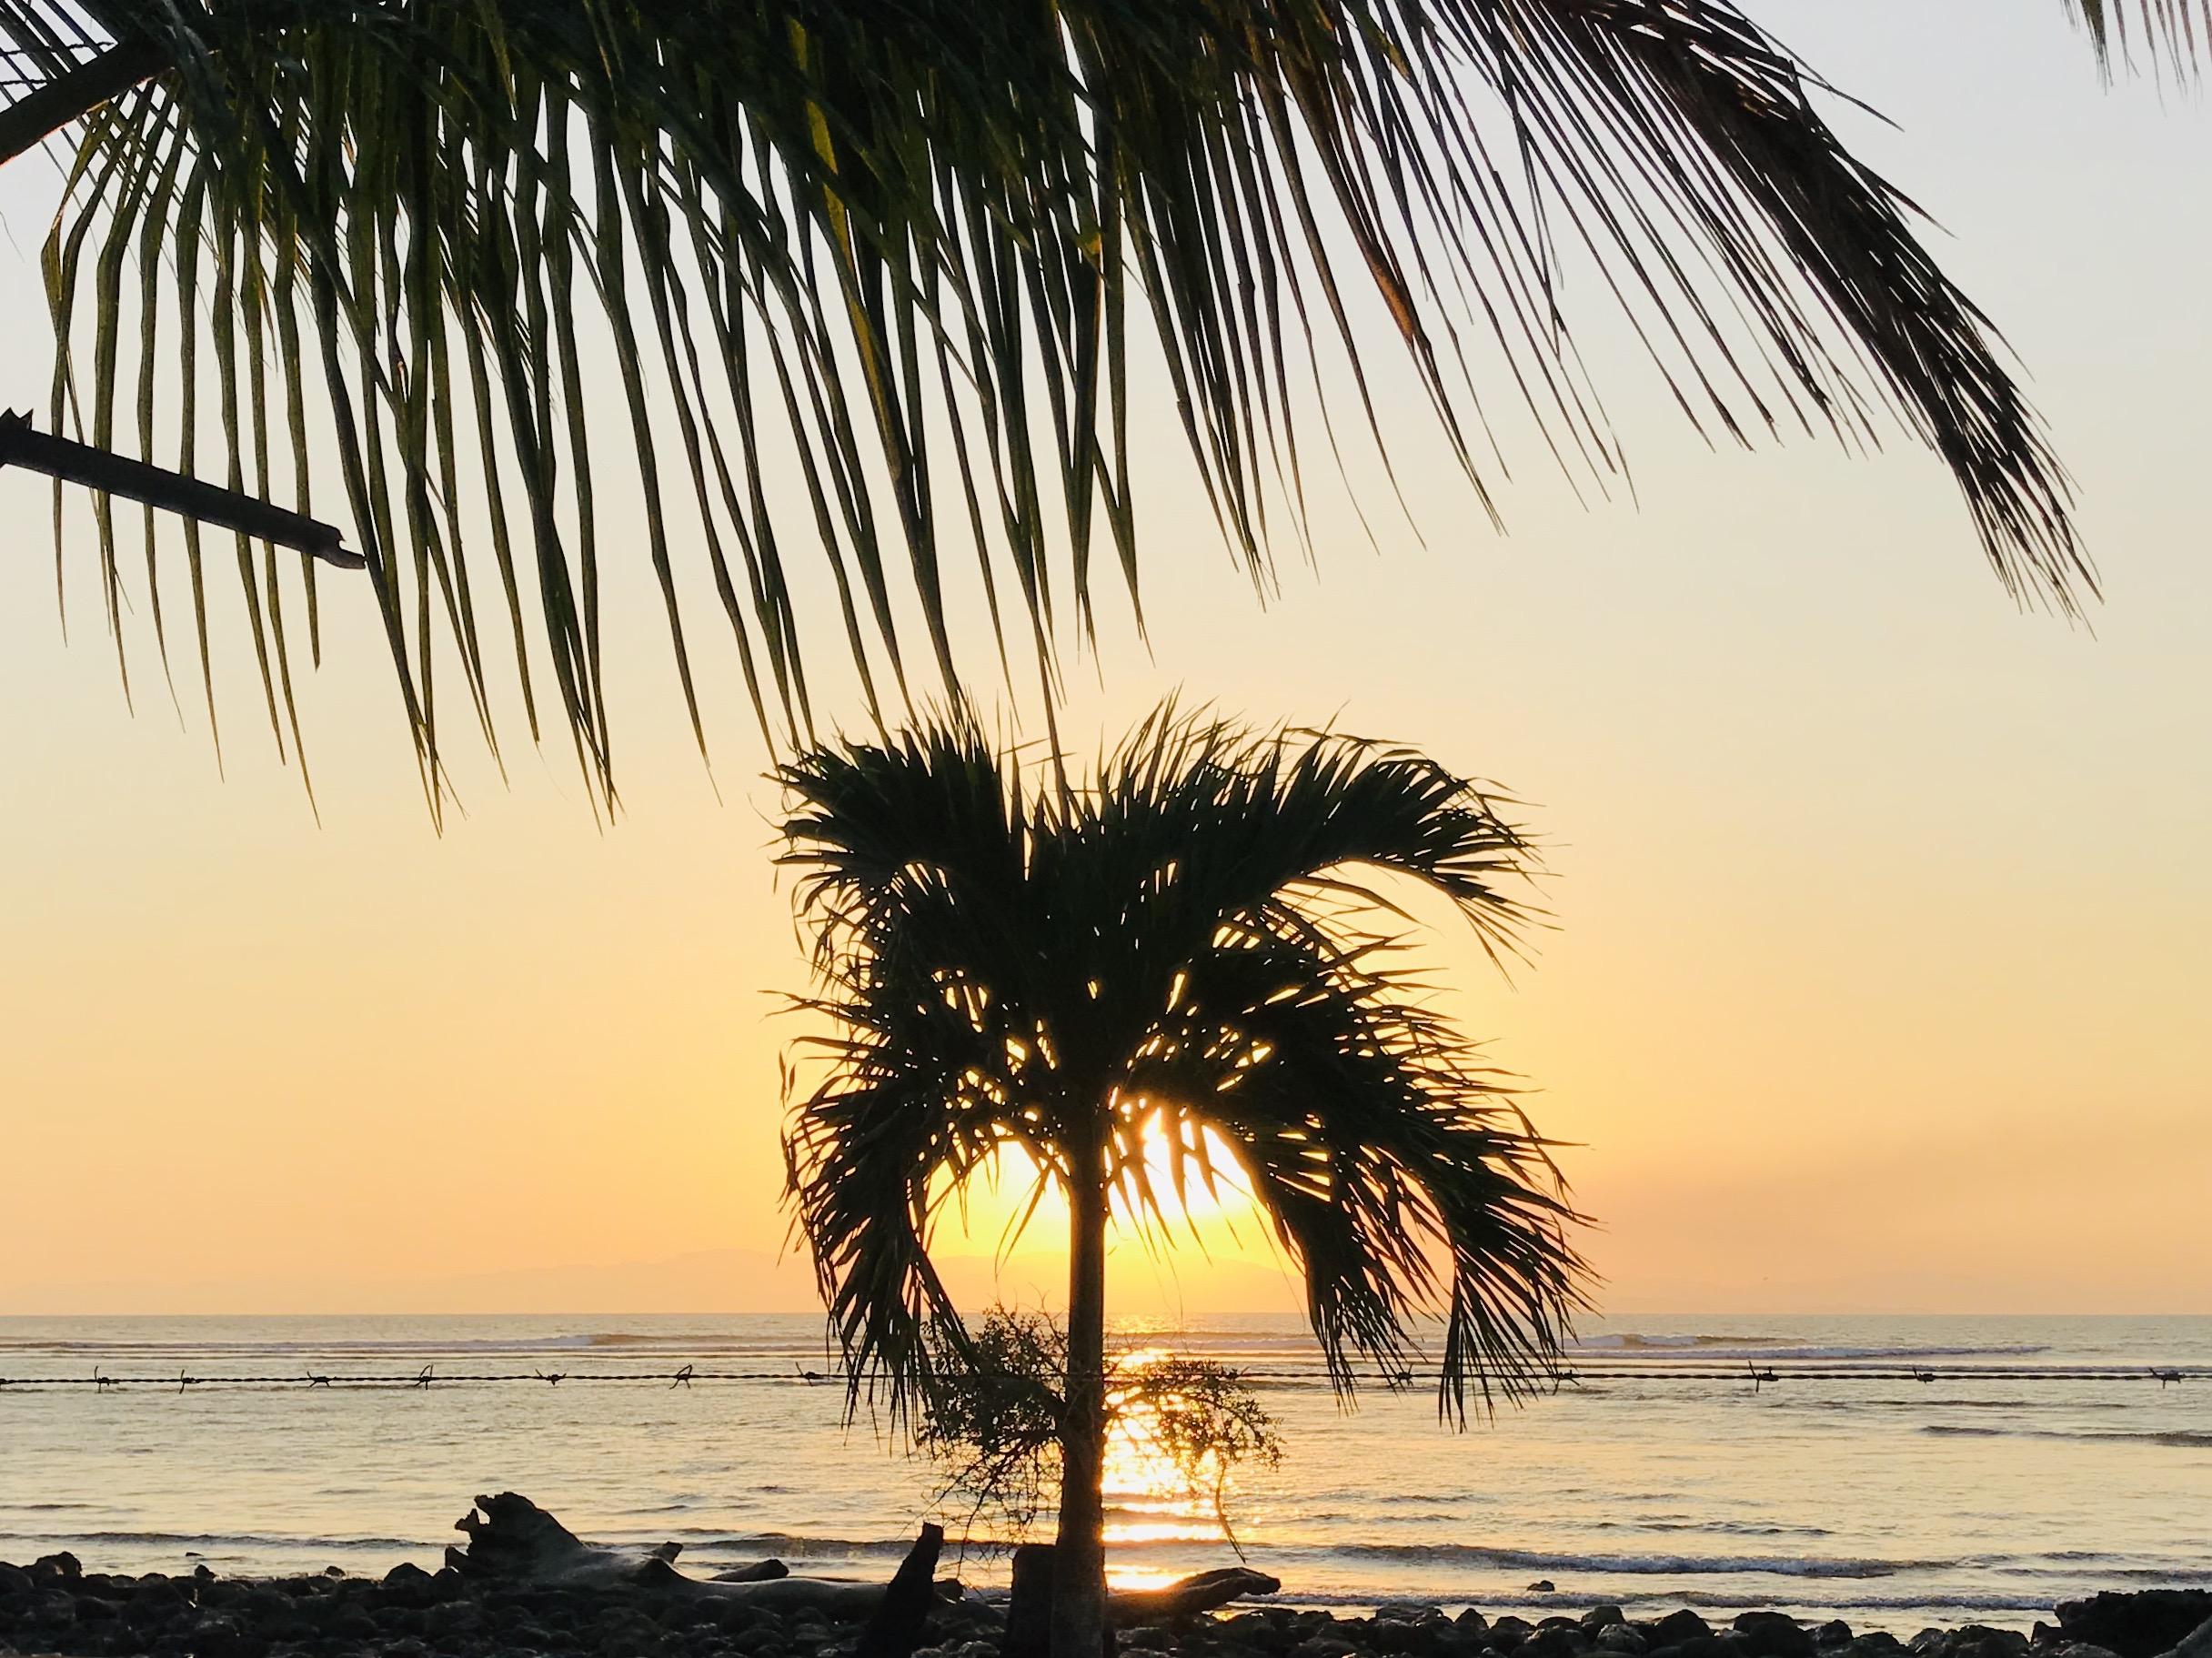 boca-barranca-palm-sunset